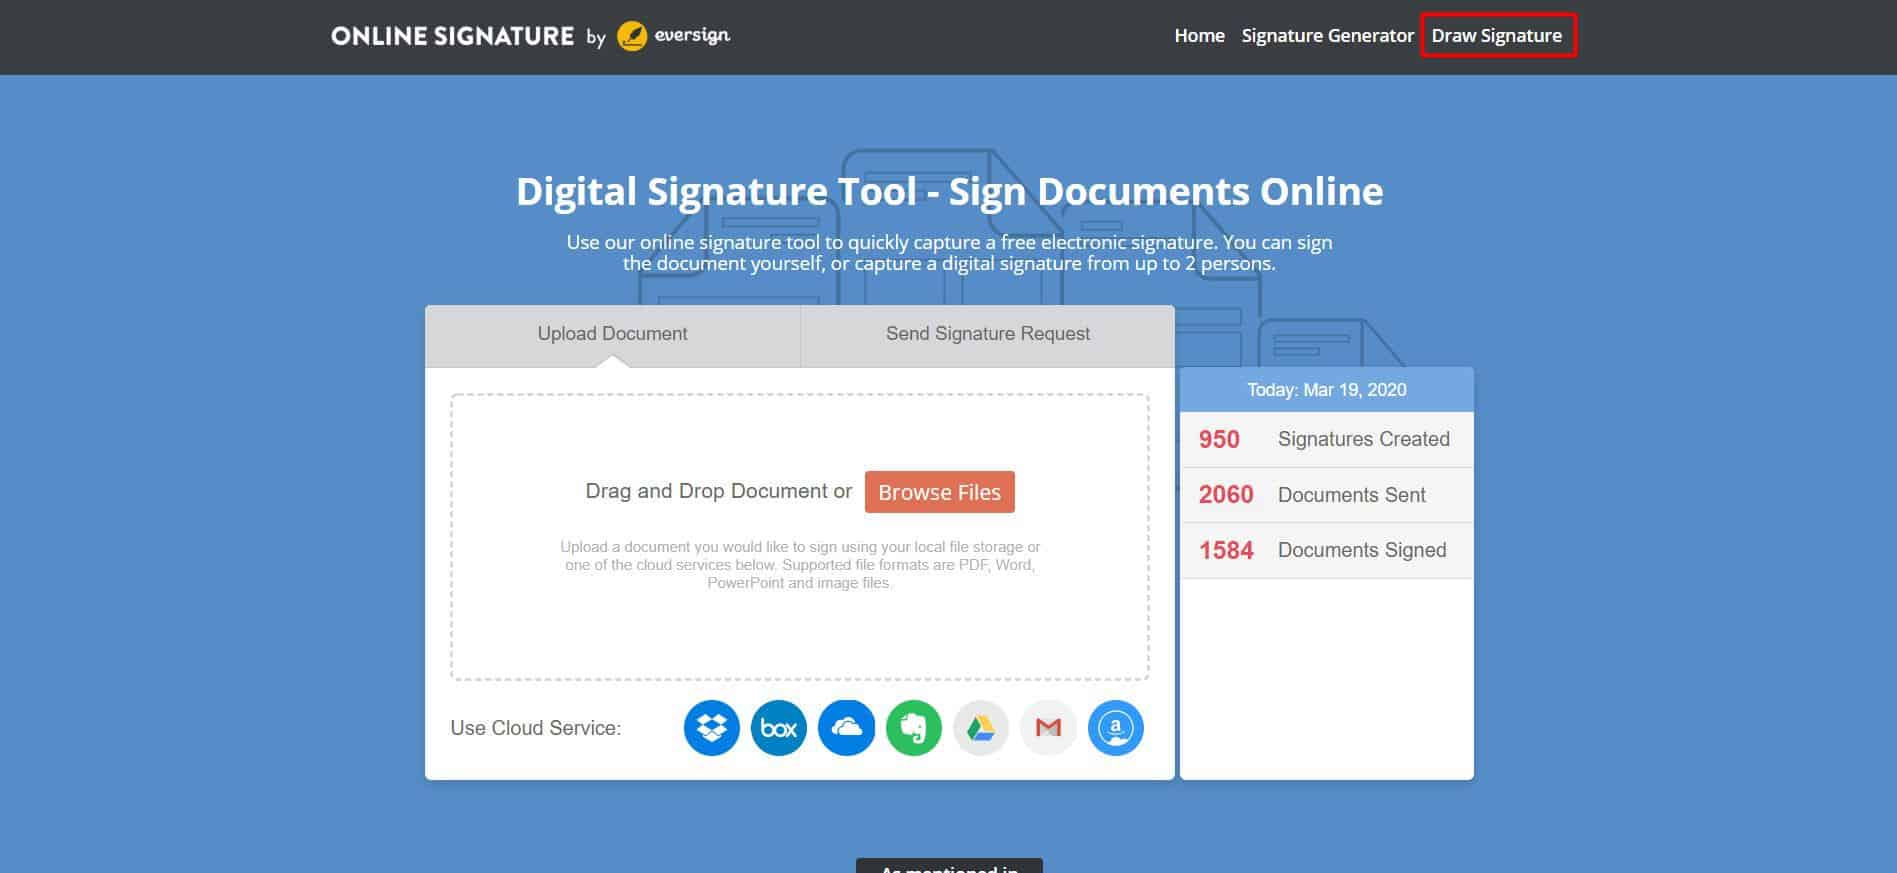 kunjungi-laman-online-signature